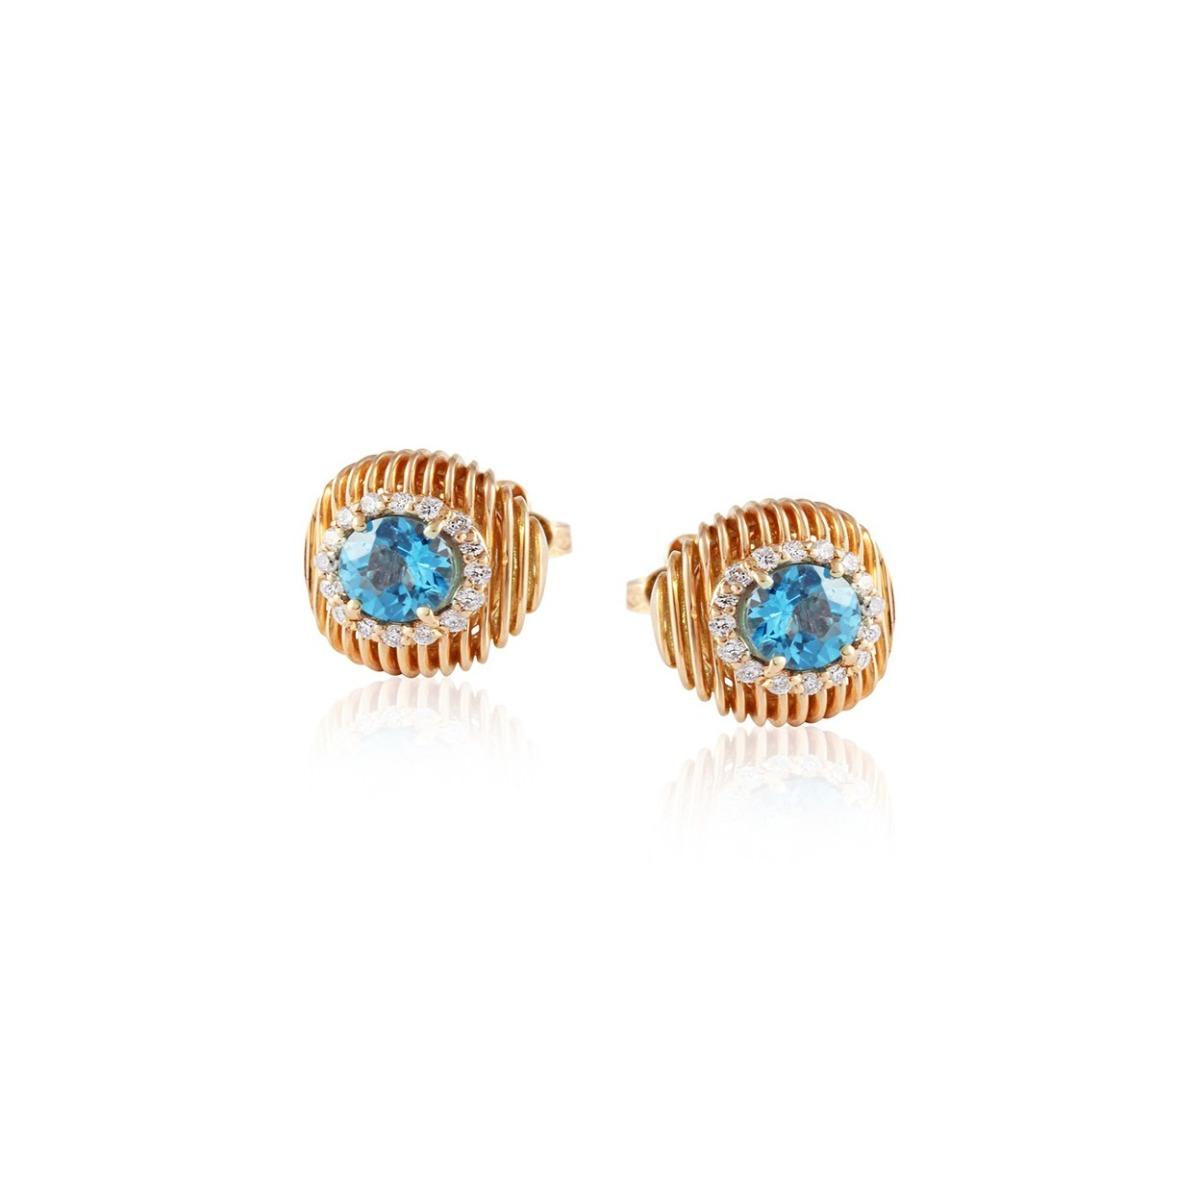 Batumi Rose Gold and Topaz Stud Earrings